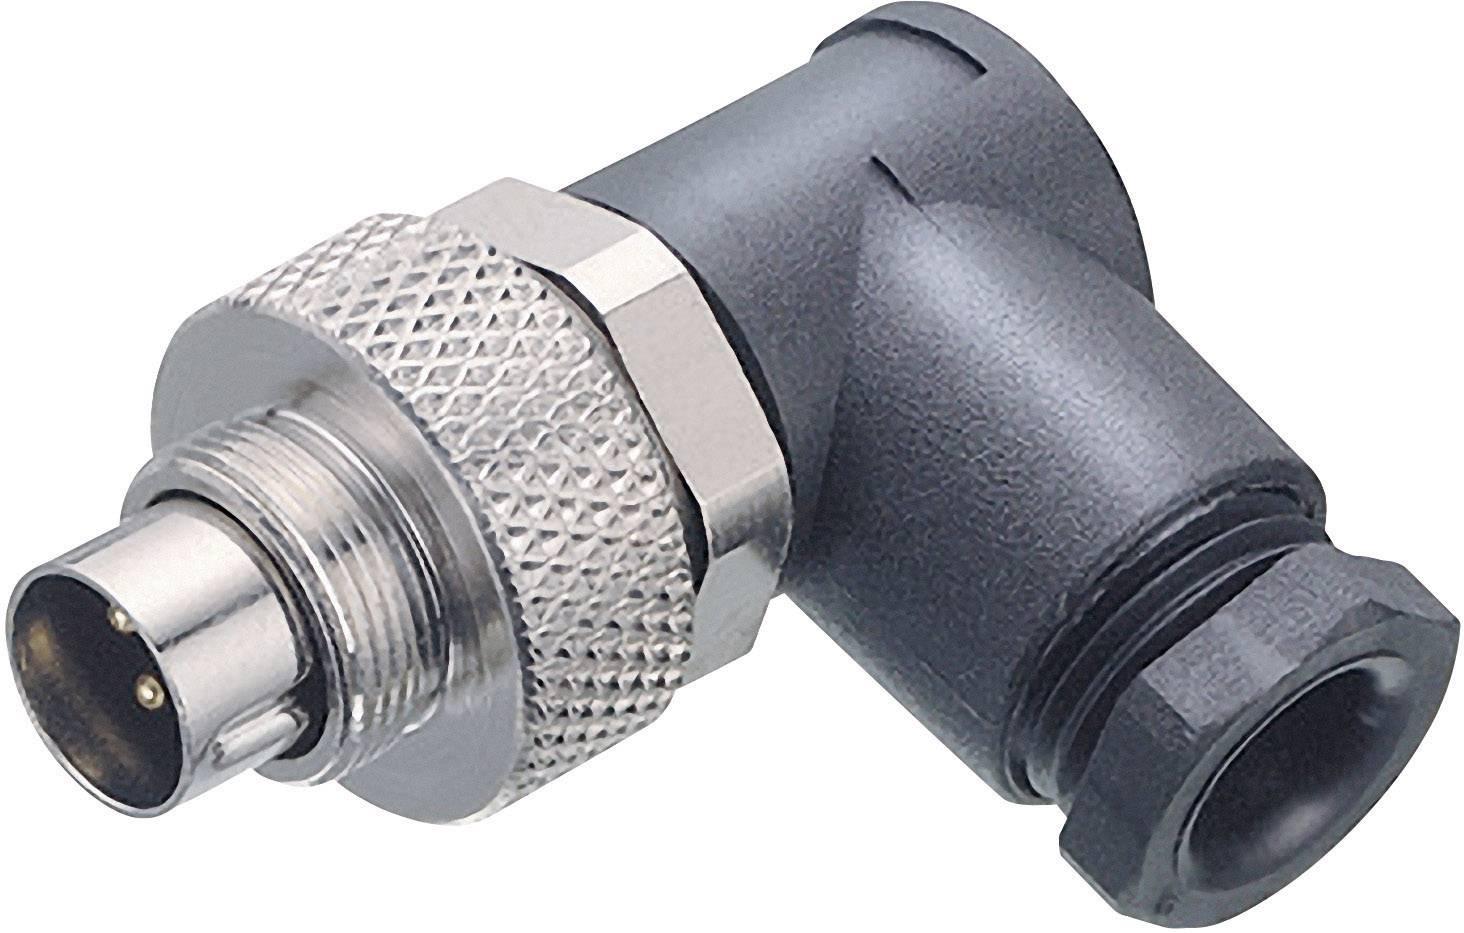 Guľatý konektor submin. Binder 99-0413-70-05, 5-pól., uhlová zástrčka, 3,5 - 5 mm, IP67